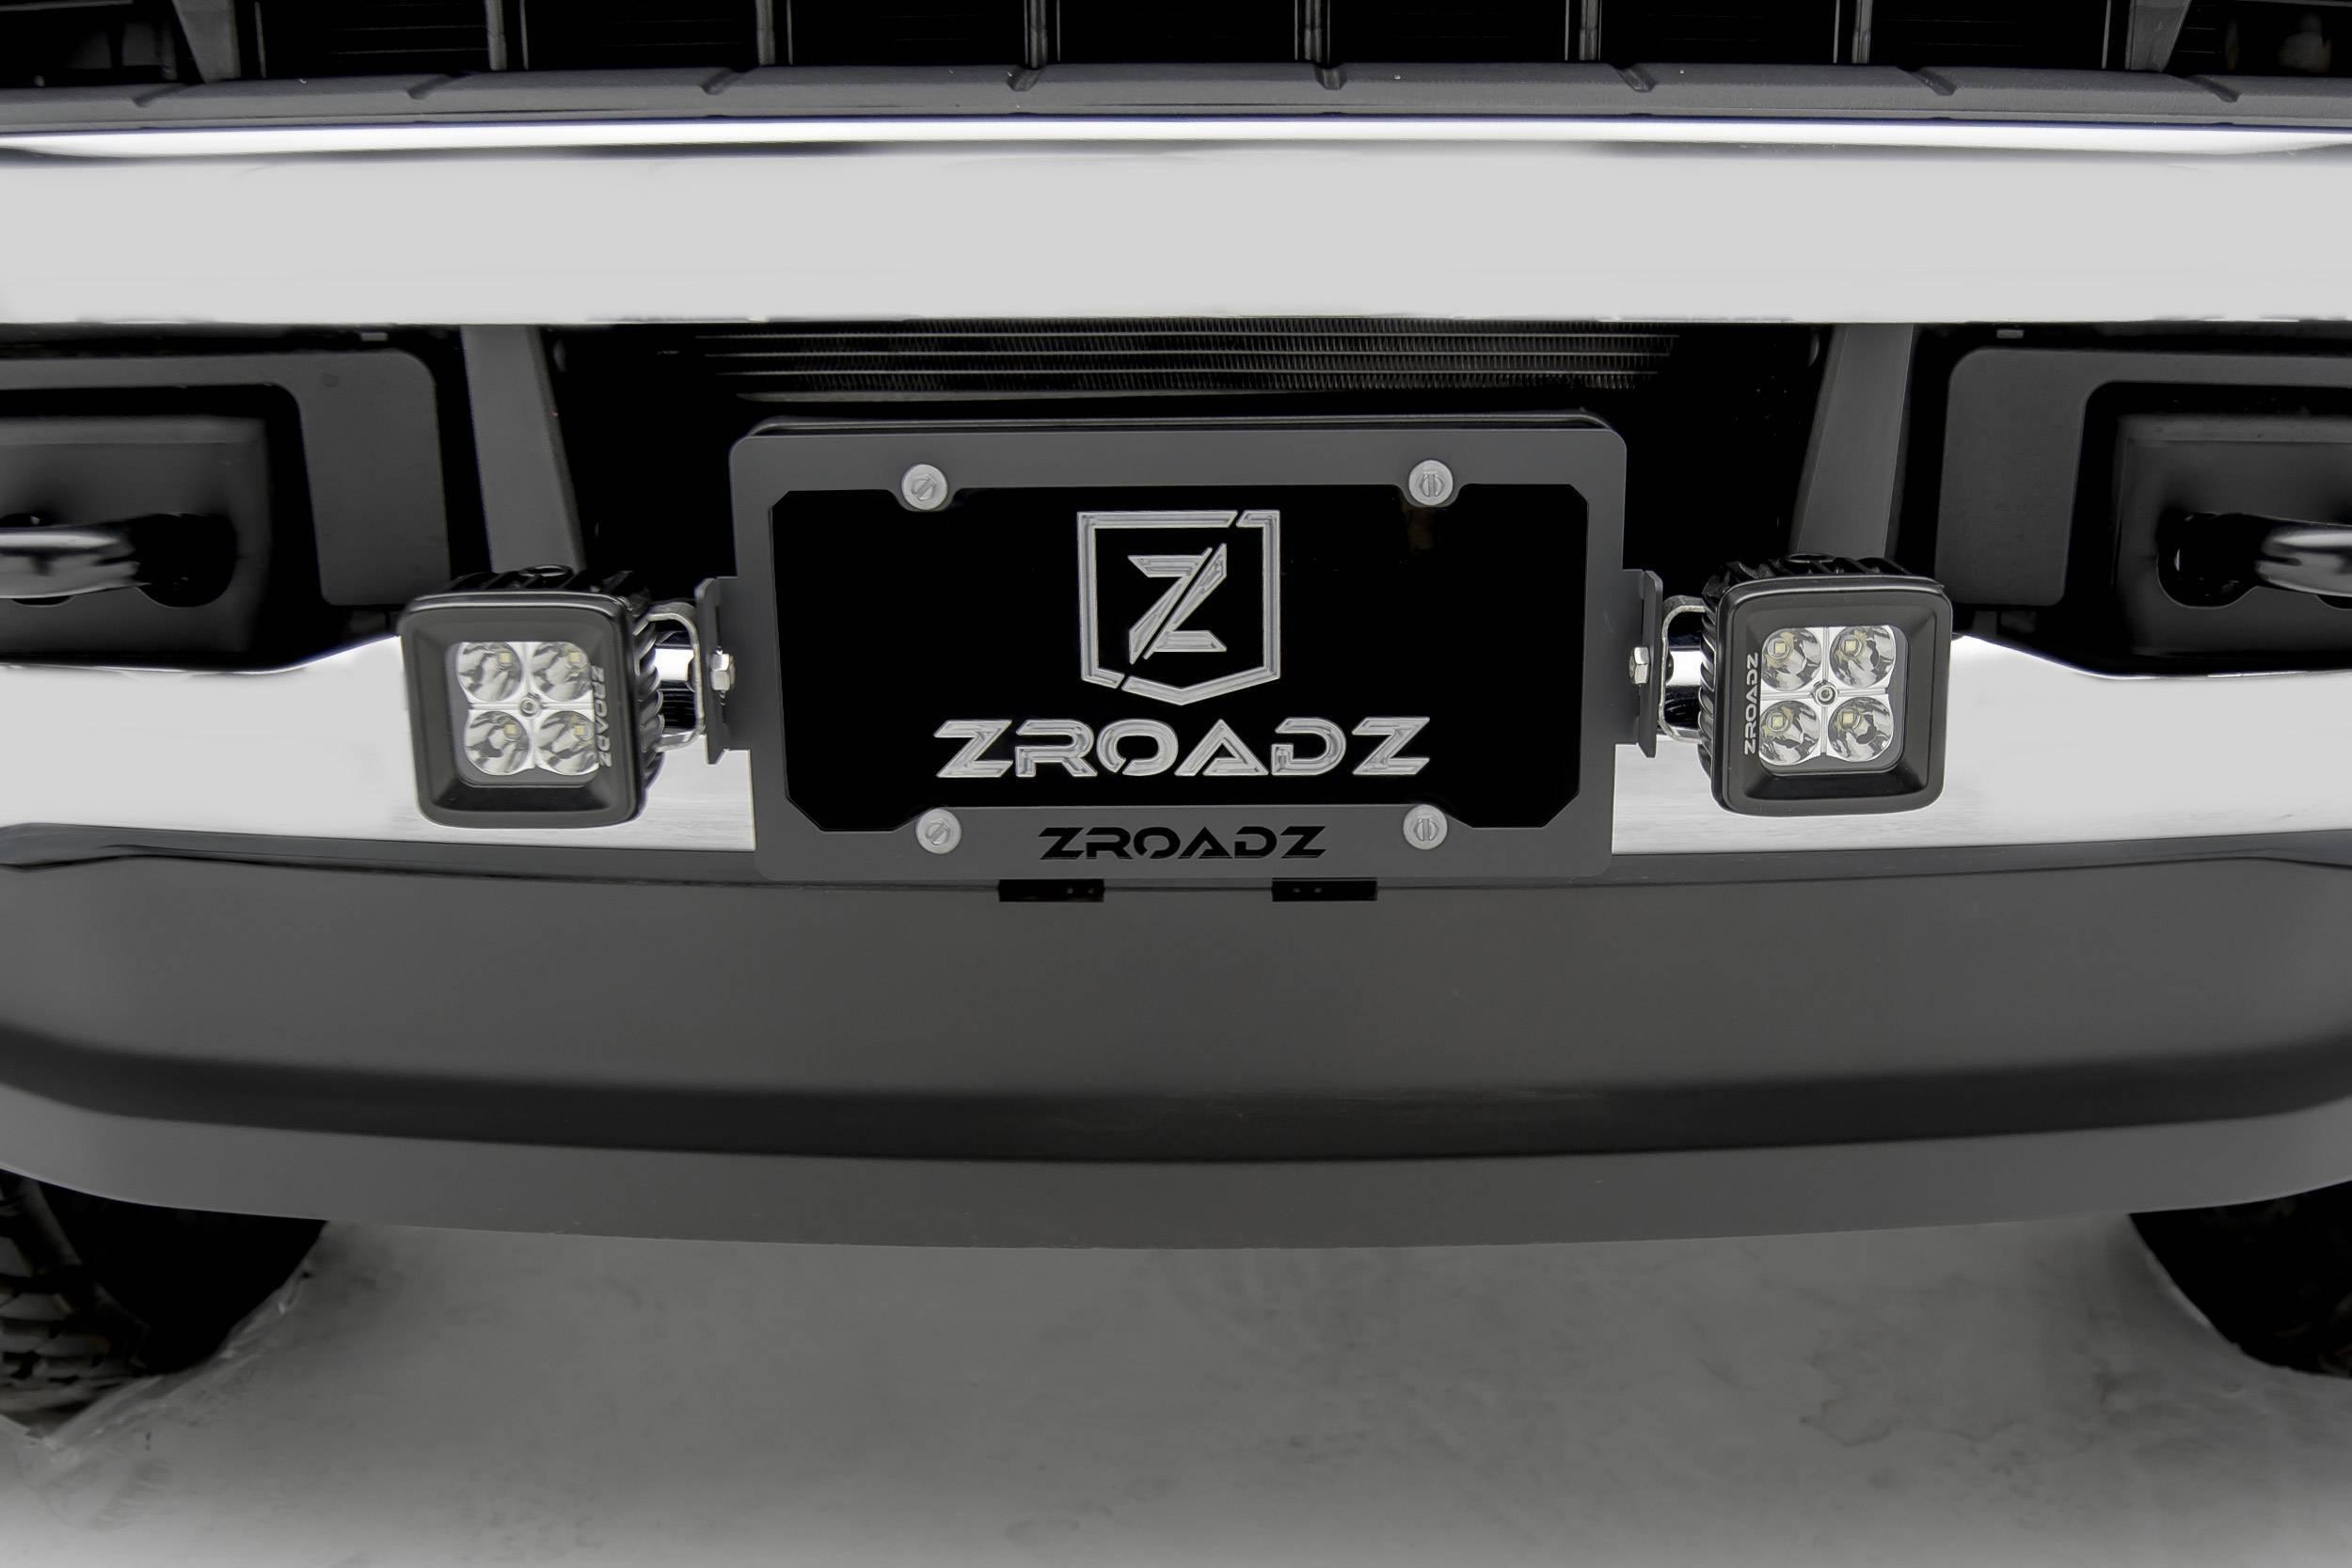 ZROADZ OFF ROAD PRODUCTS - Universal License Plate Frame LED Bracket to mount (2) 3 Inch LED Pod Lights - PN #Z310005